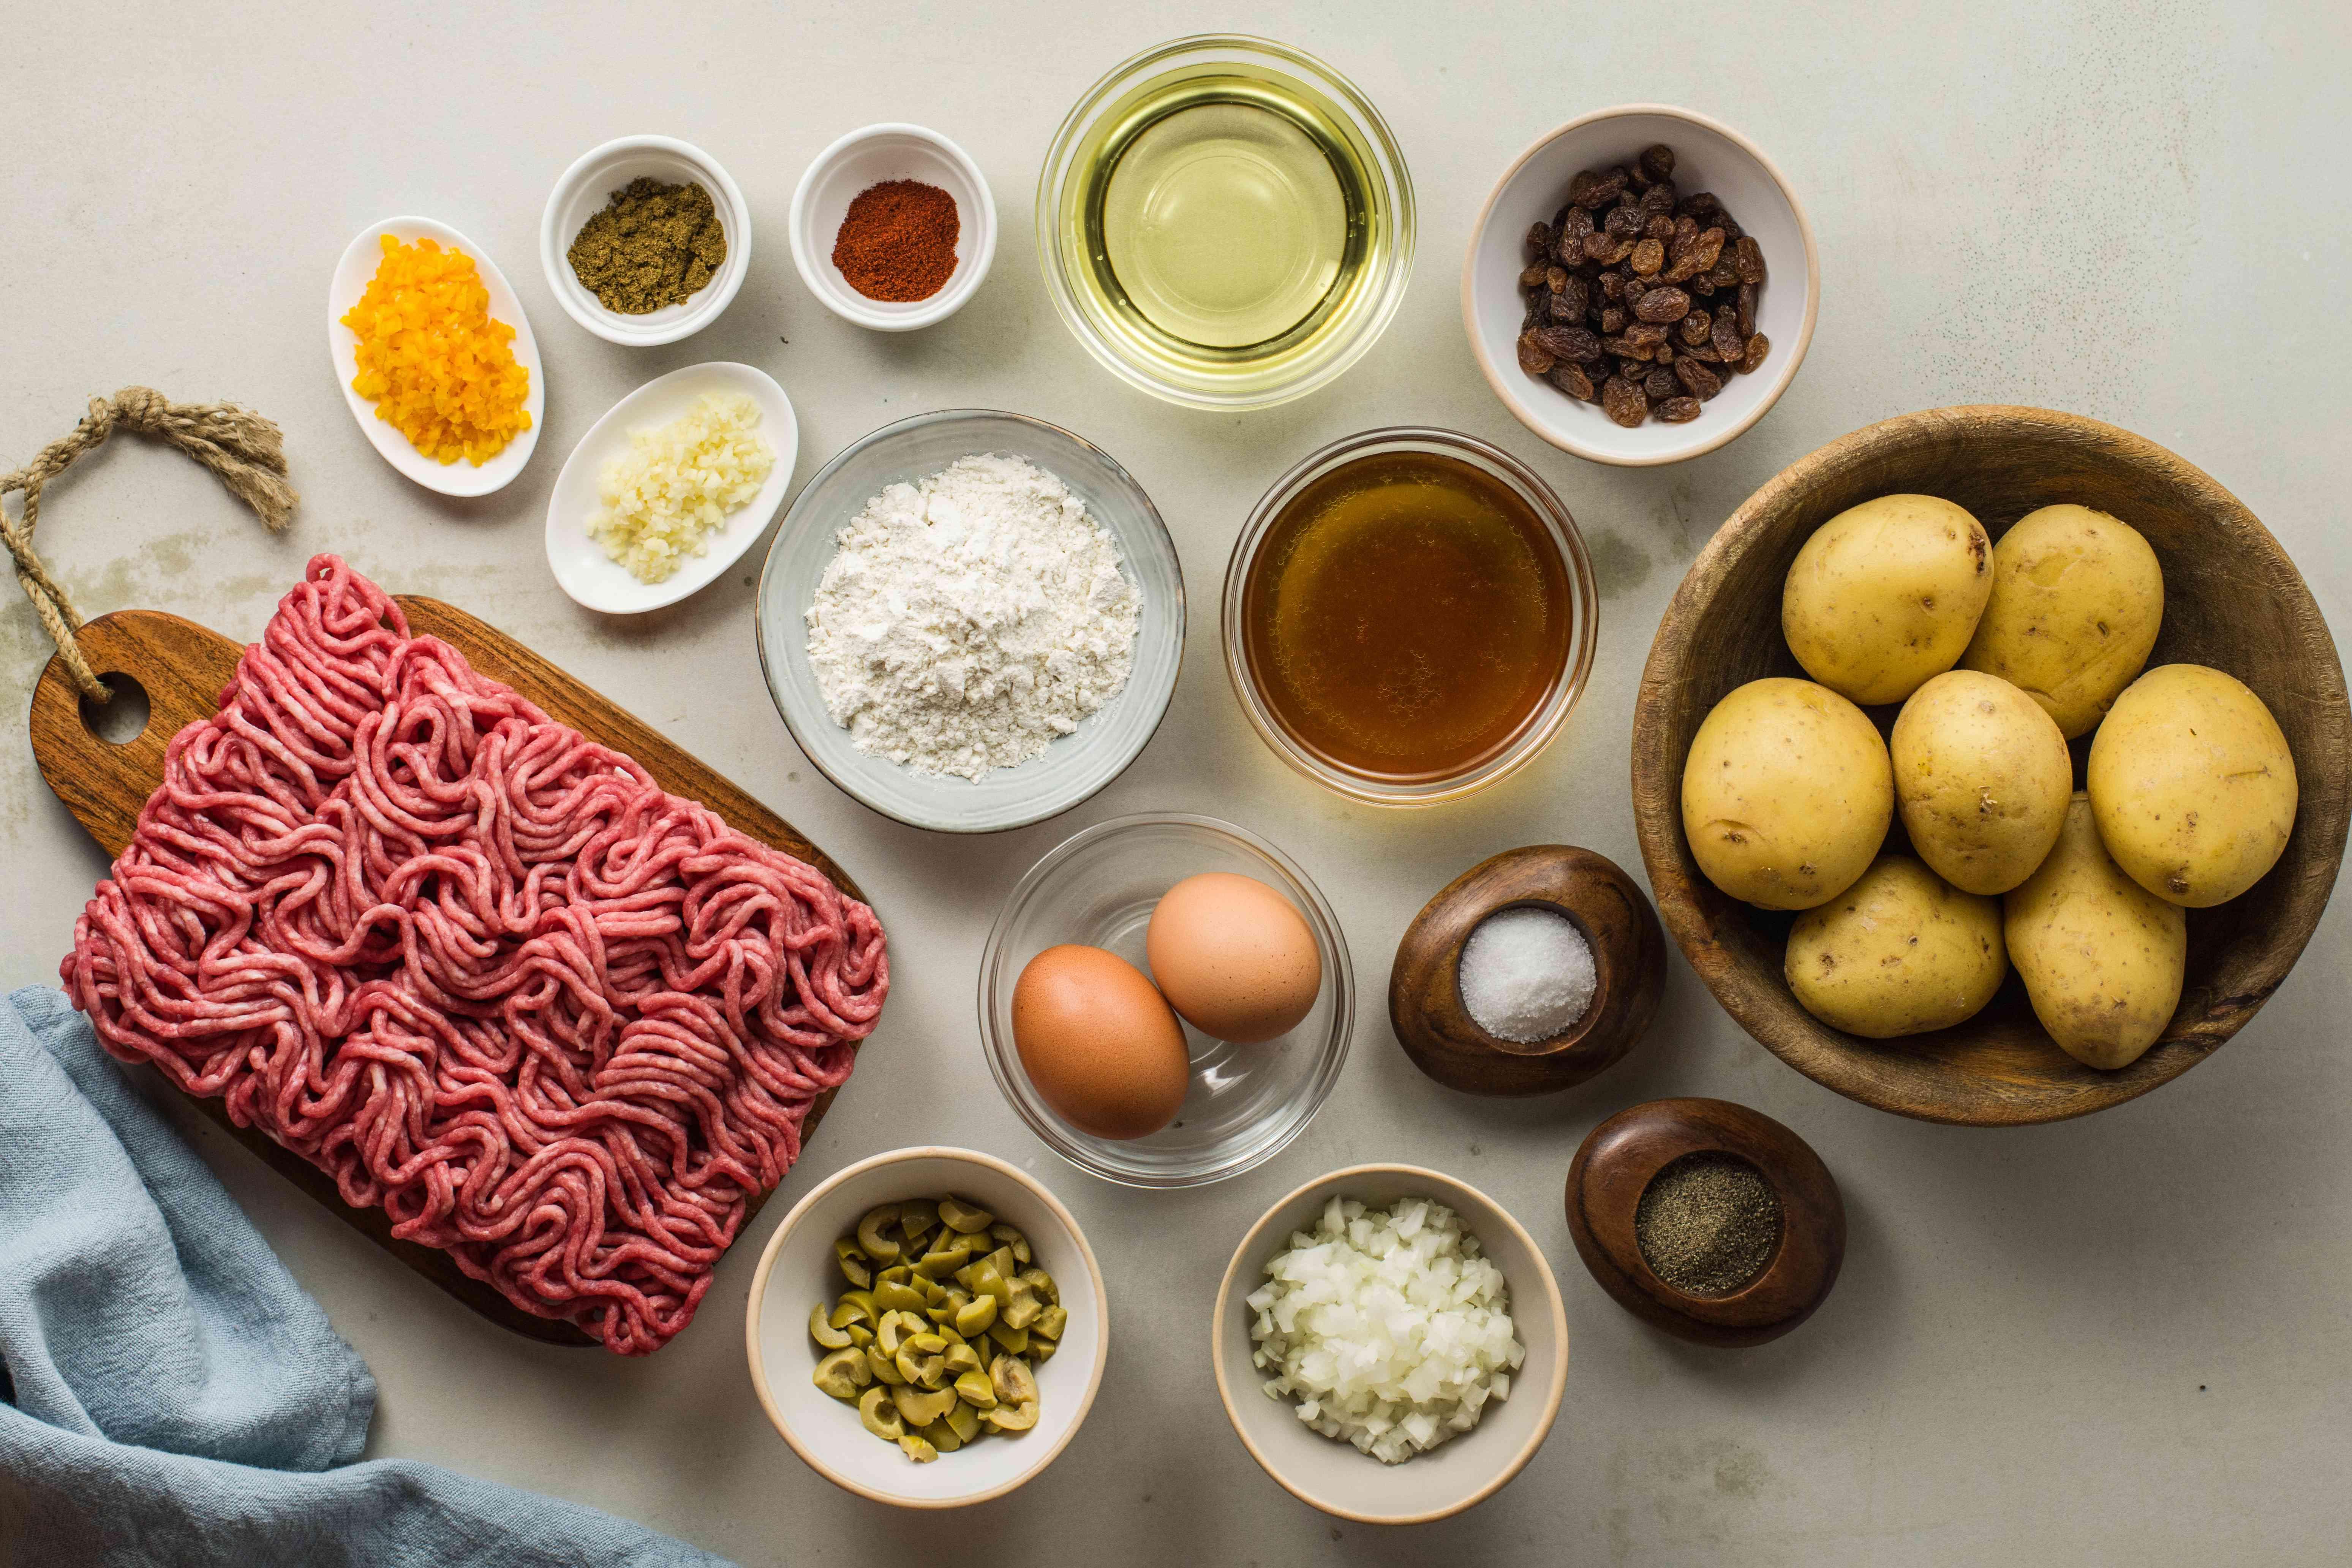 Ingredients for papas rellenas